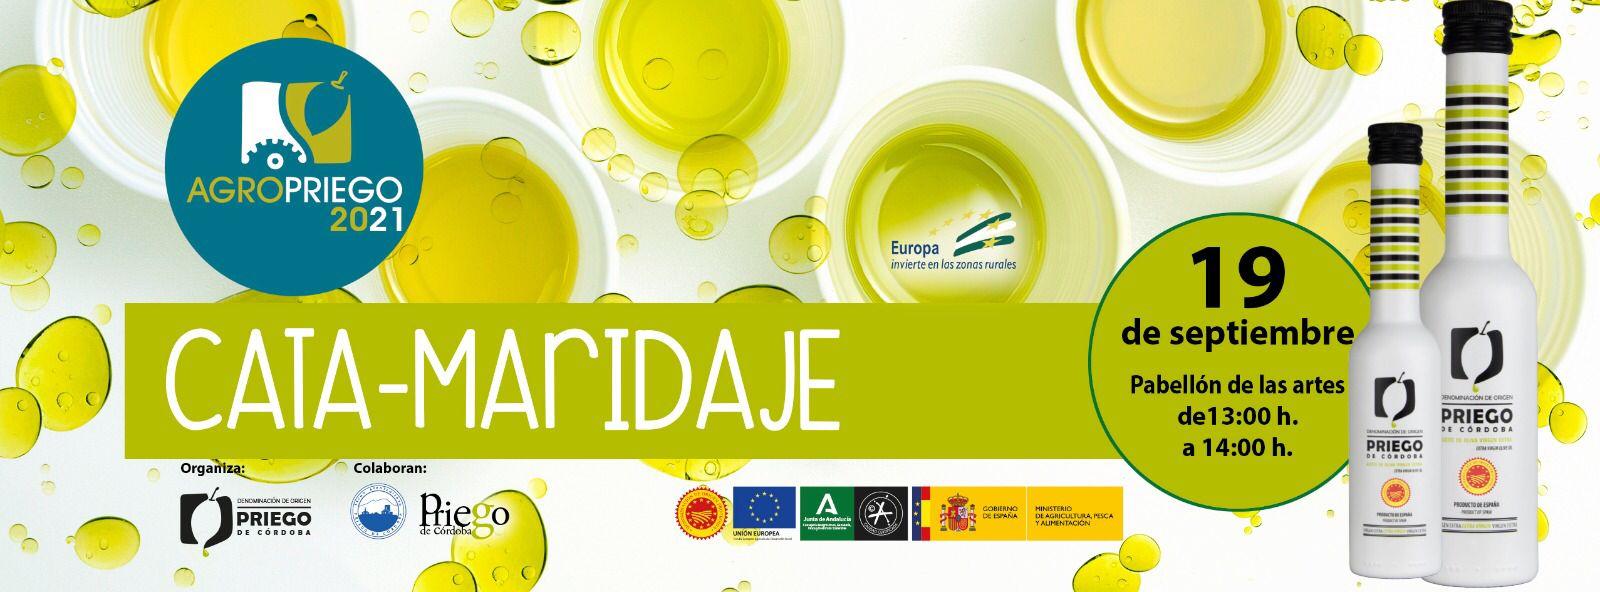 Cata-Maridaje Agropriego 2021 - DOP Priego de Córdoba